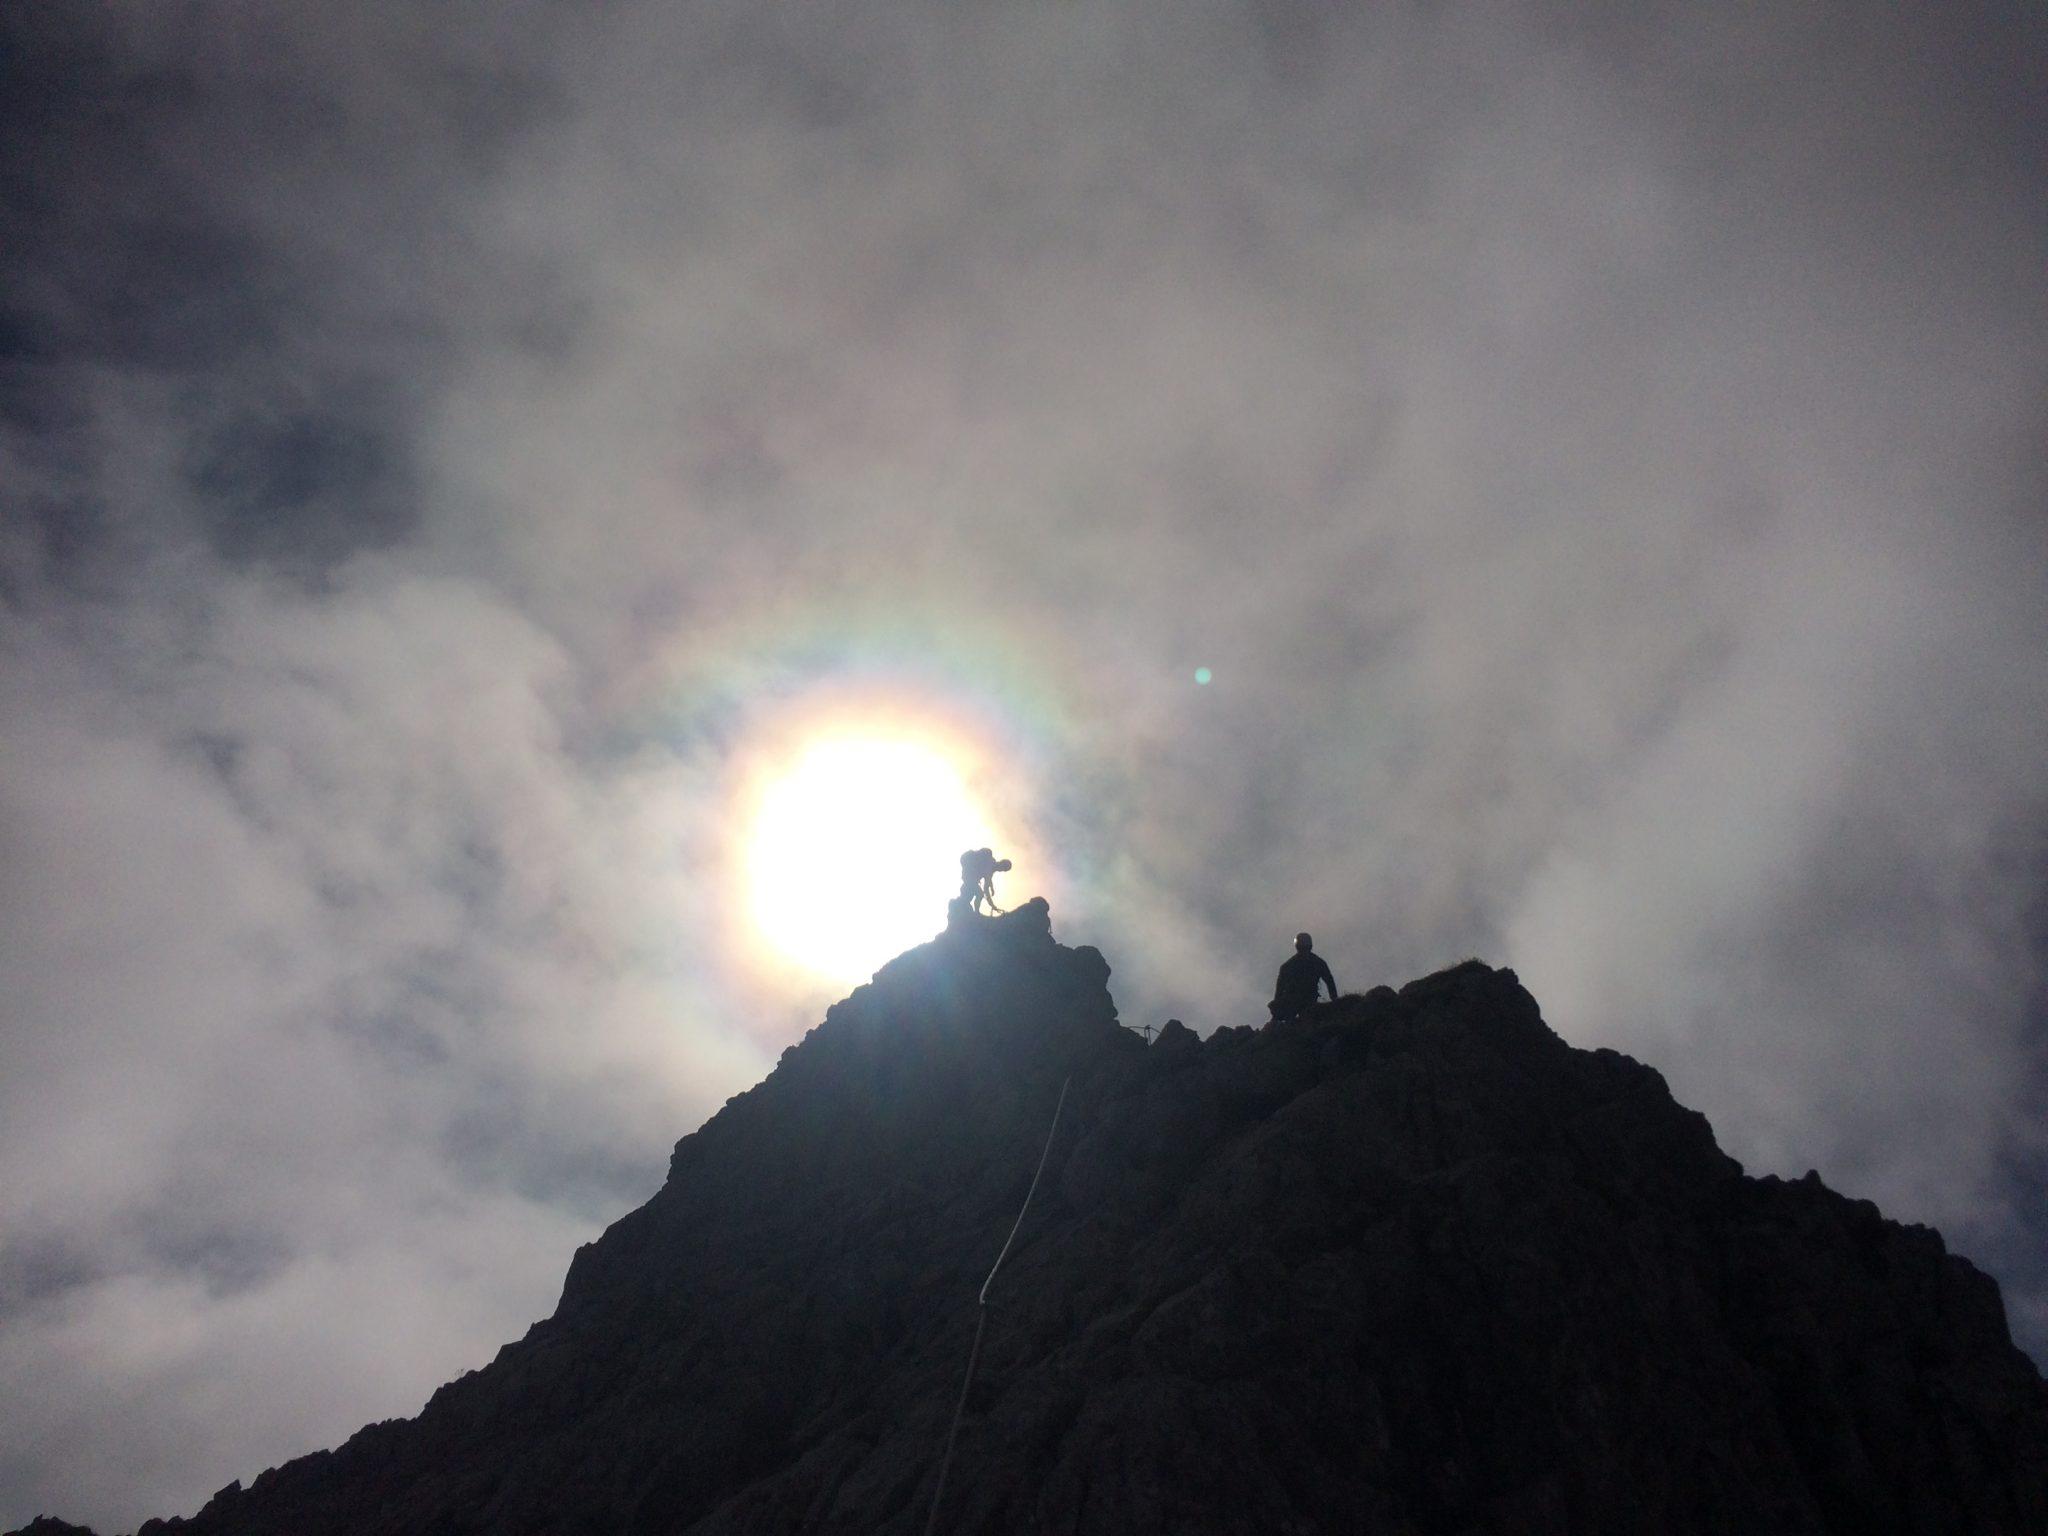 Innsbrucker Klettersteig | Climbers Paradise